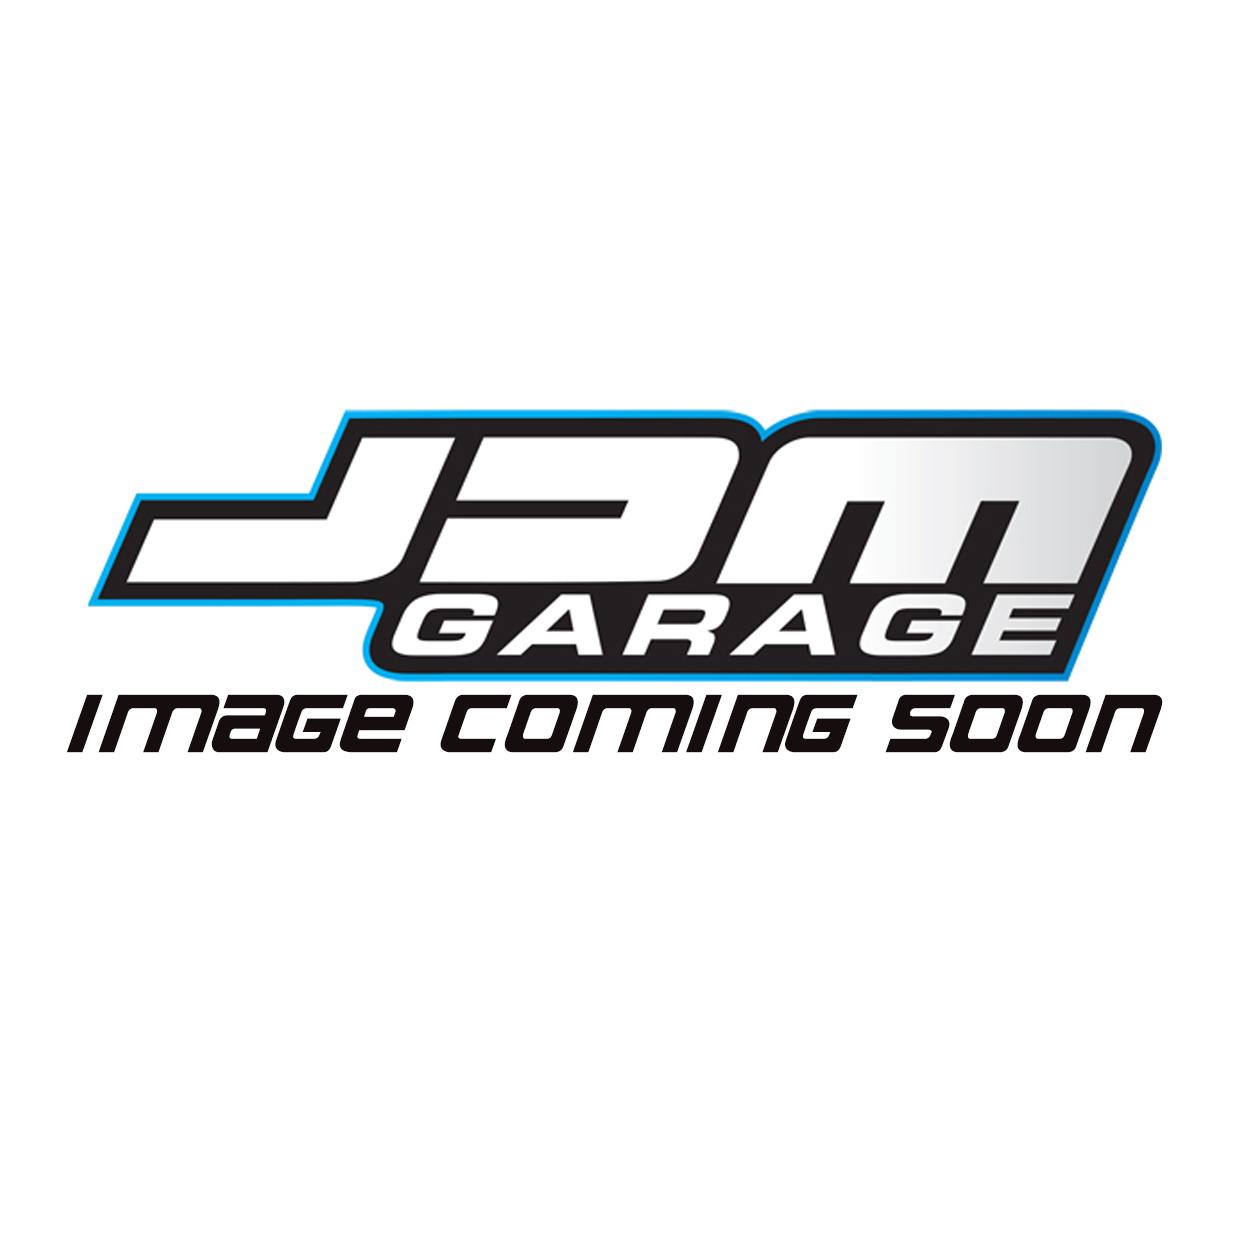 Genuine Toyota Drivers Side RH Headlight For Toyota Chaser JZX100 Tourer V / Tourer S 81130-22712